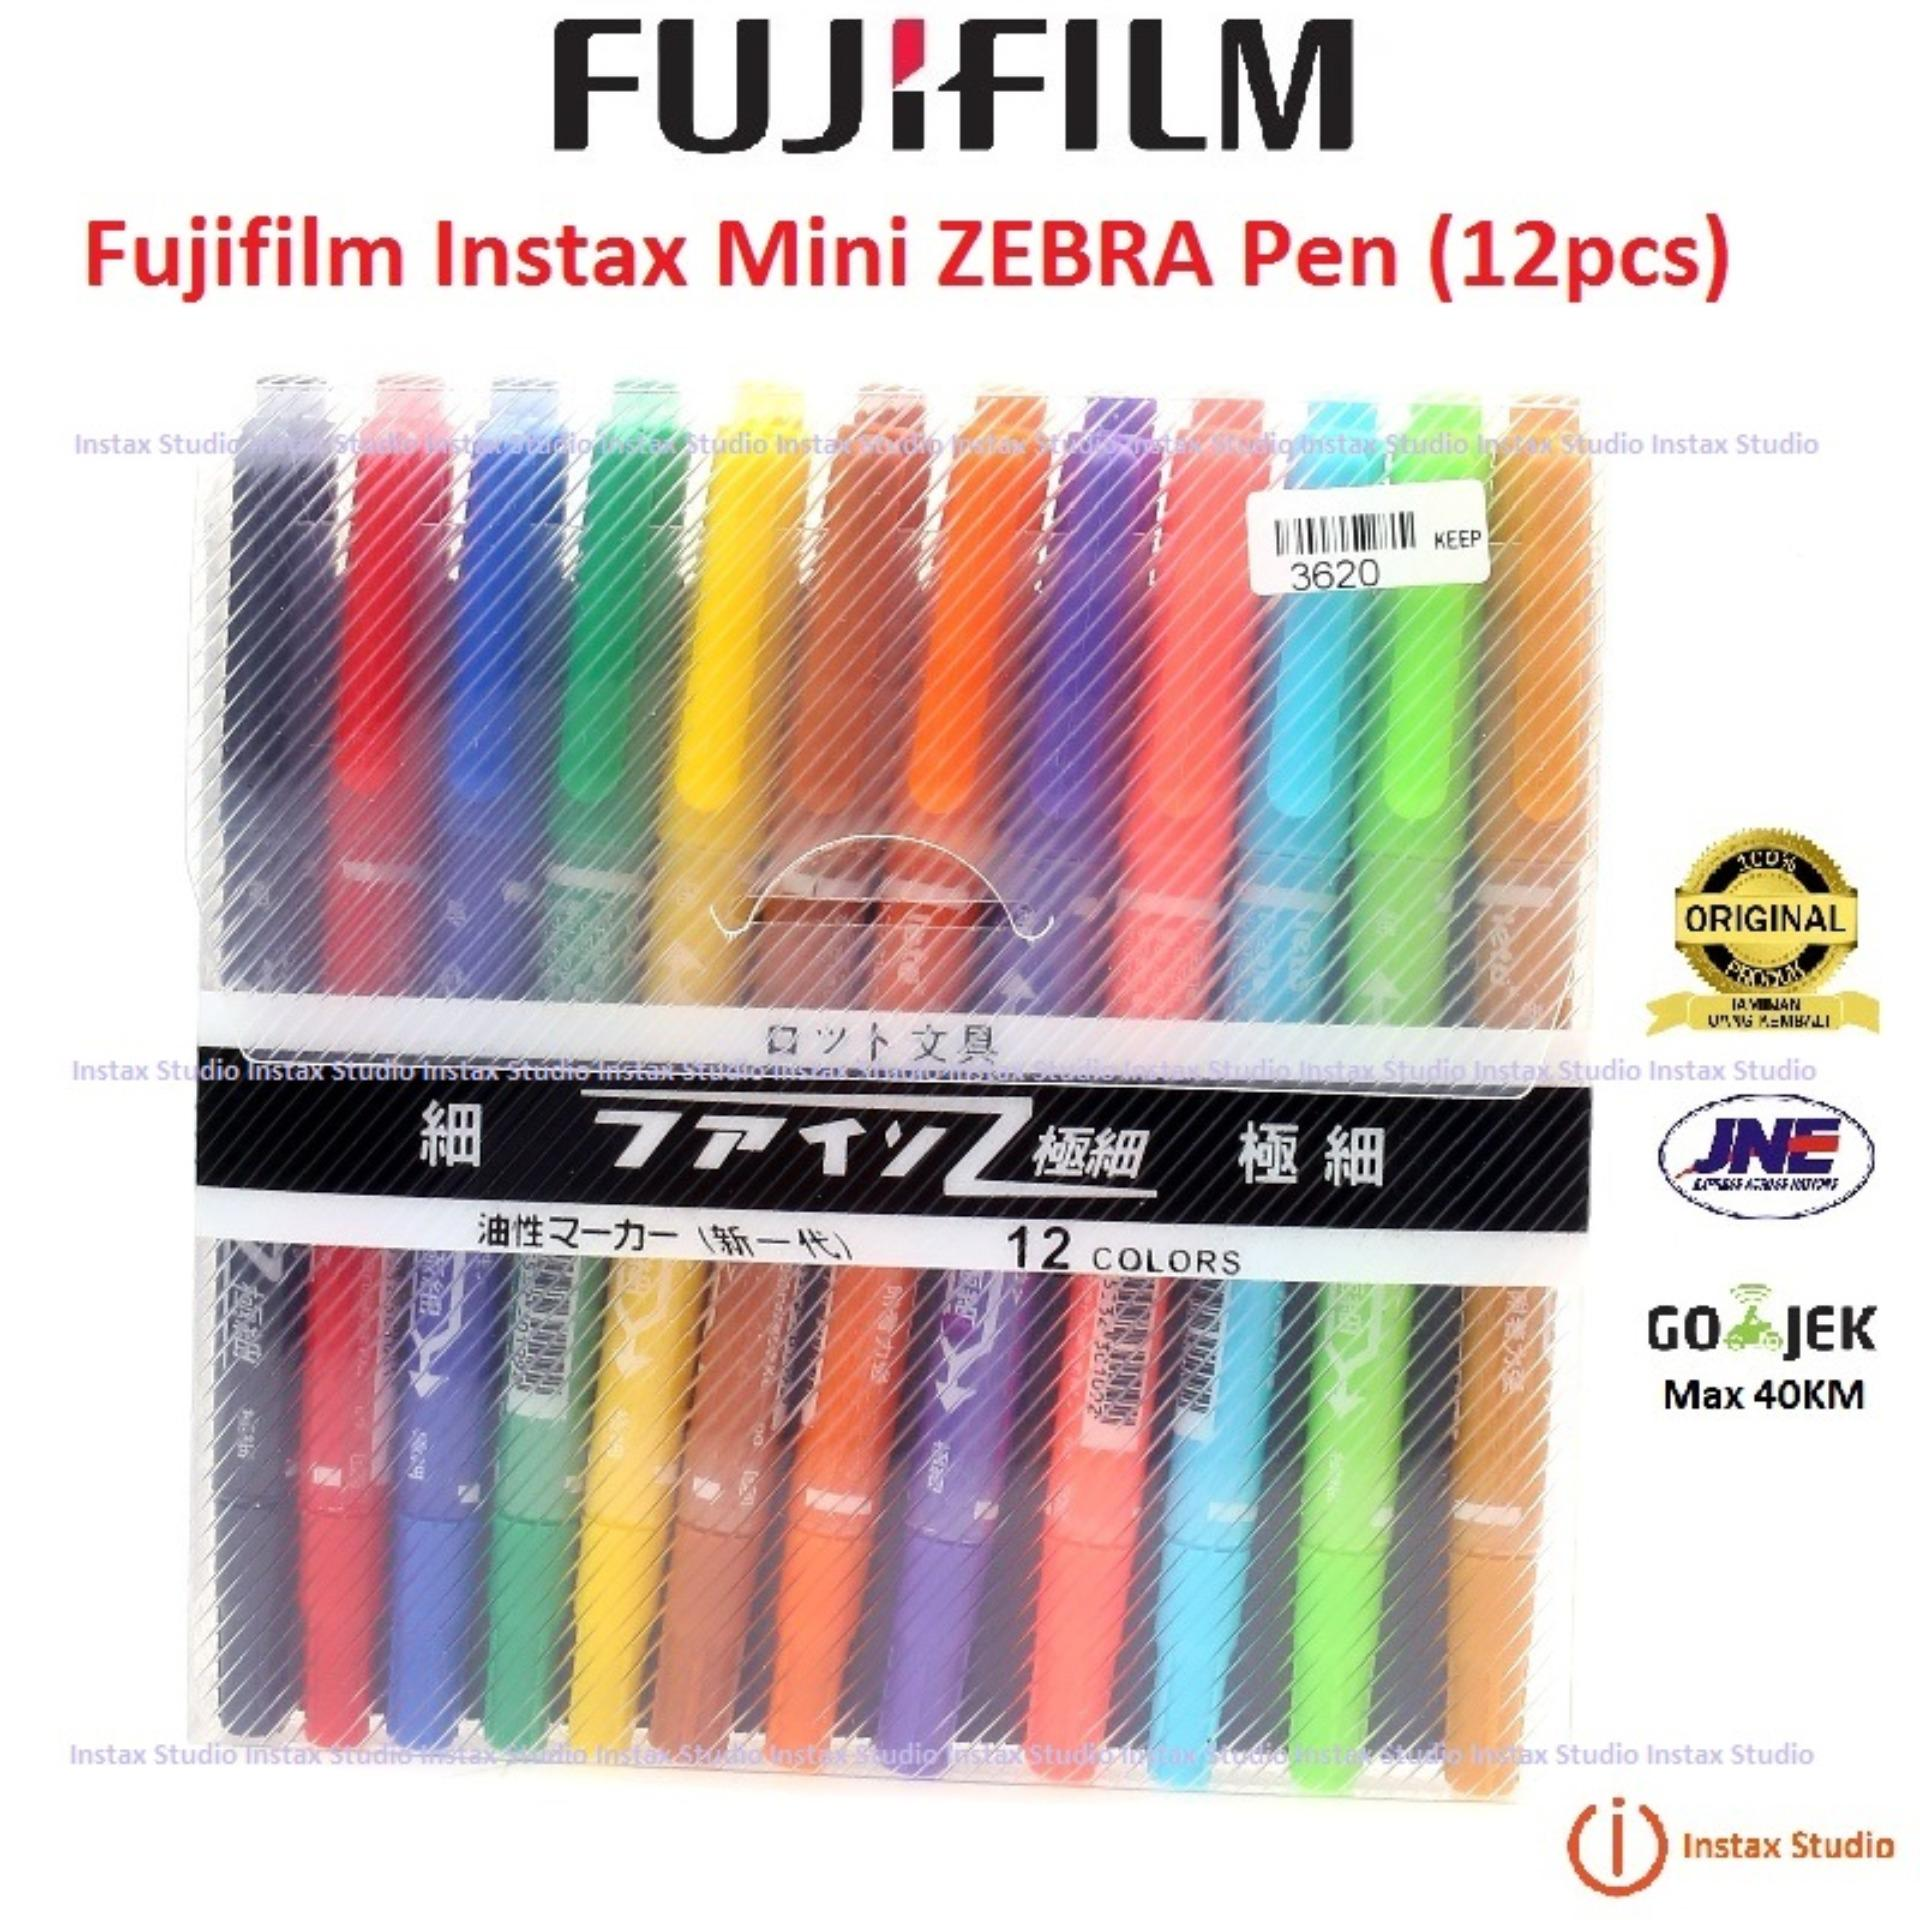 Jual Fujifilm Instax Mini Zebra Pen Kamera Polaroid Instax Pena Zebra Instax Branded